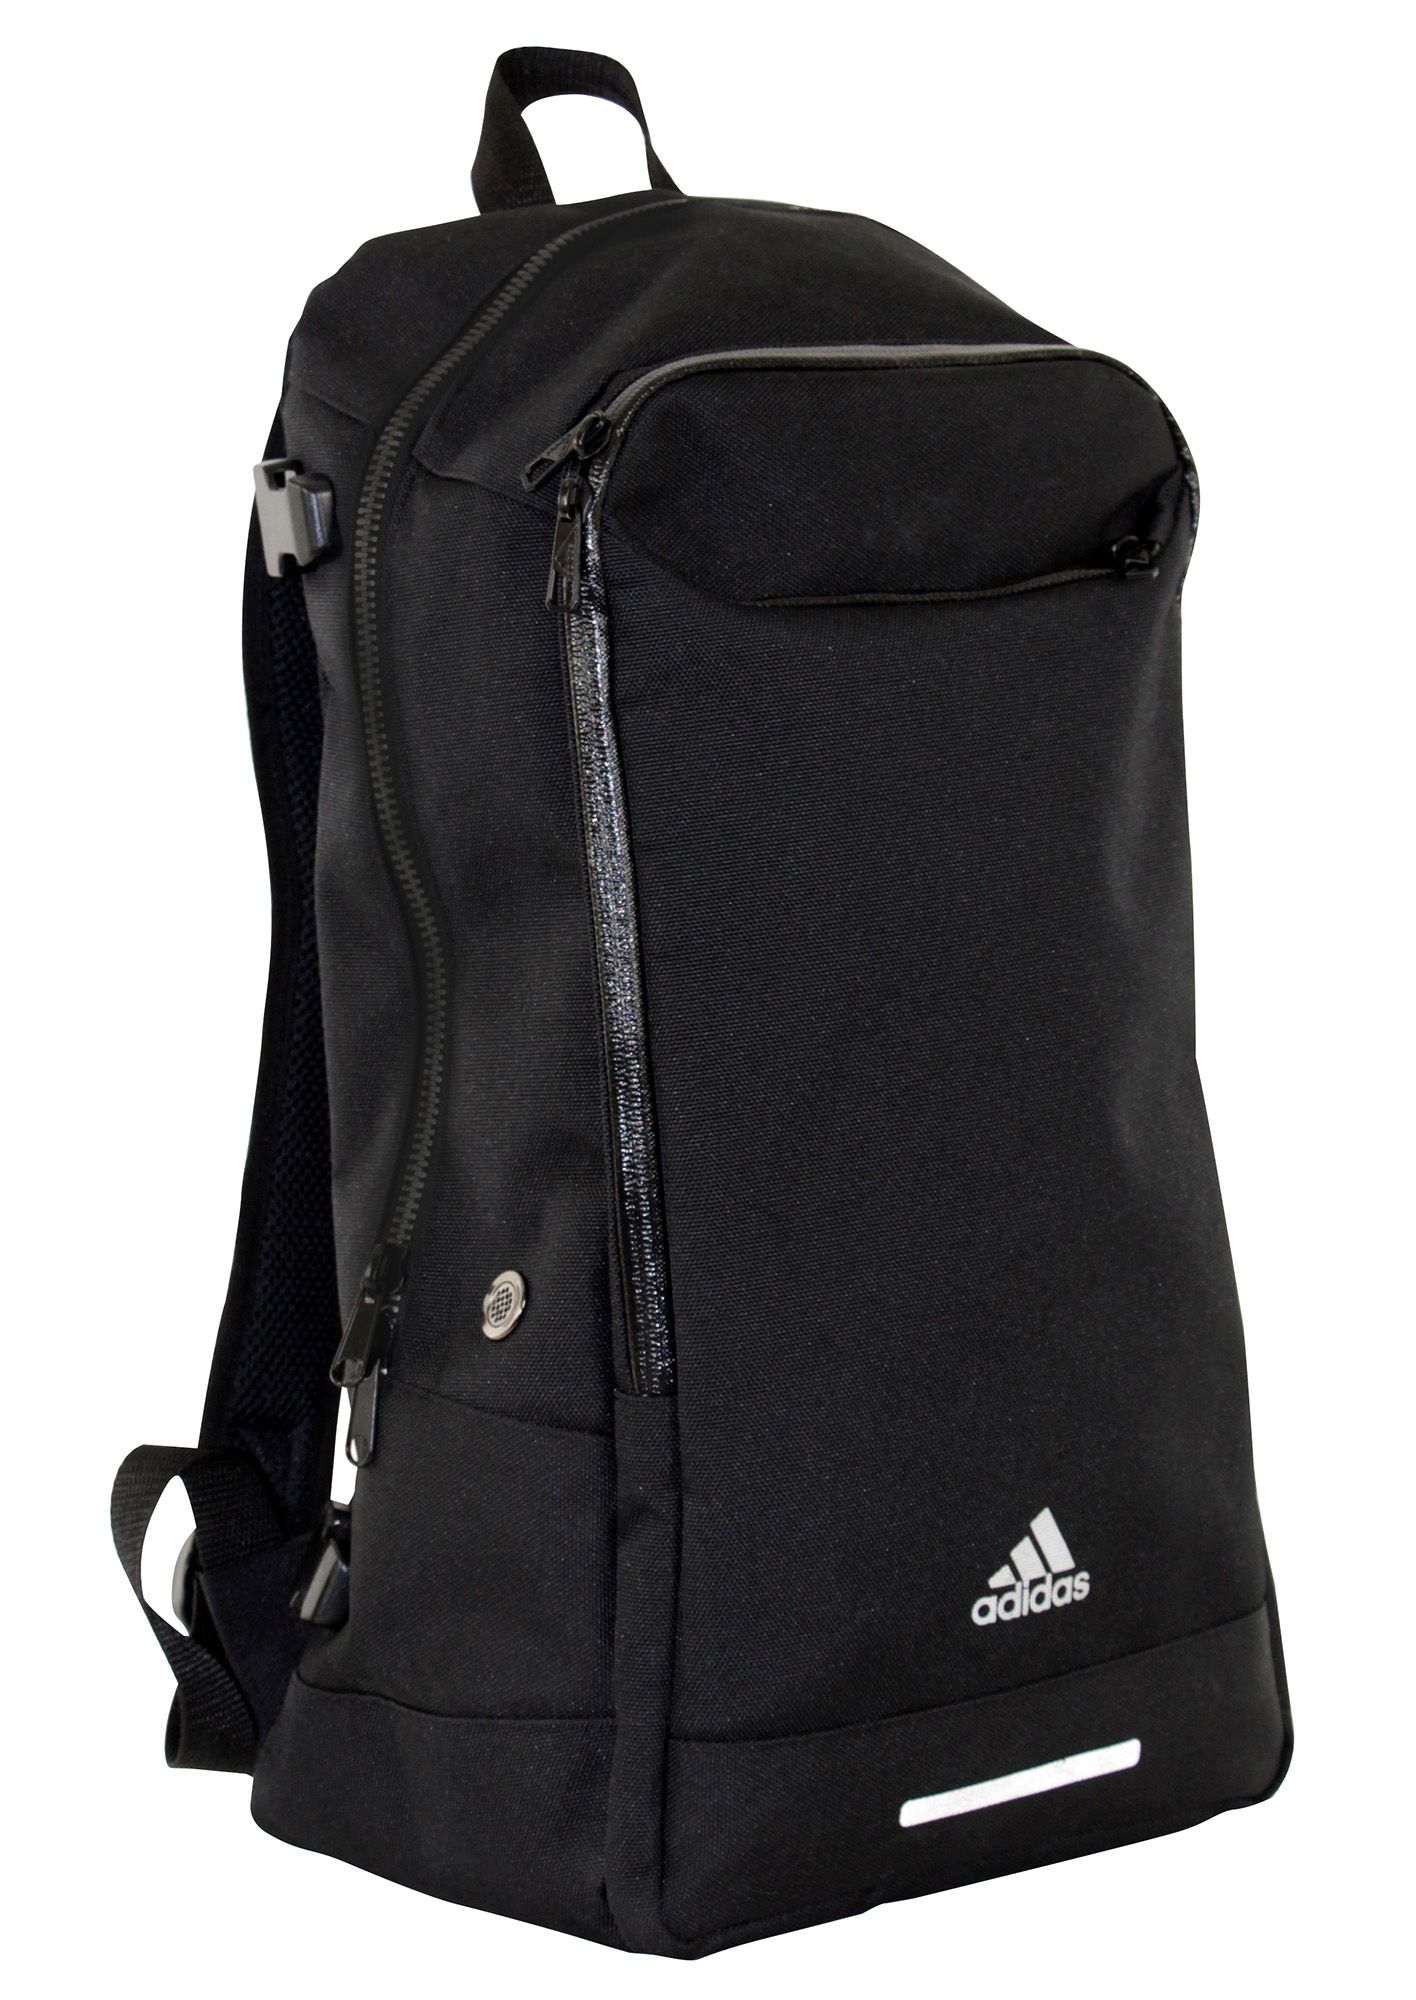 ADIDAS PERFORMANCE adidas Performance Sportrucksack, »Training Backpack«